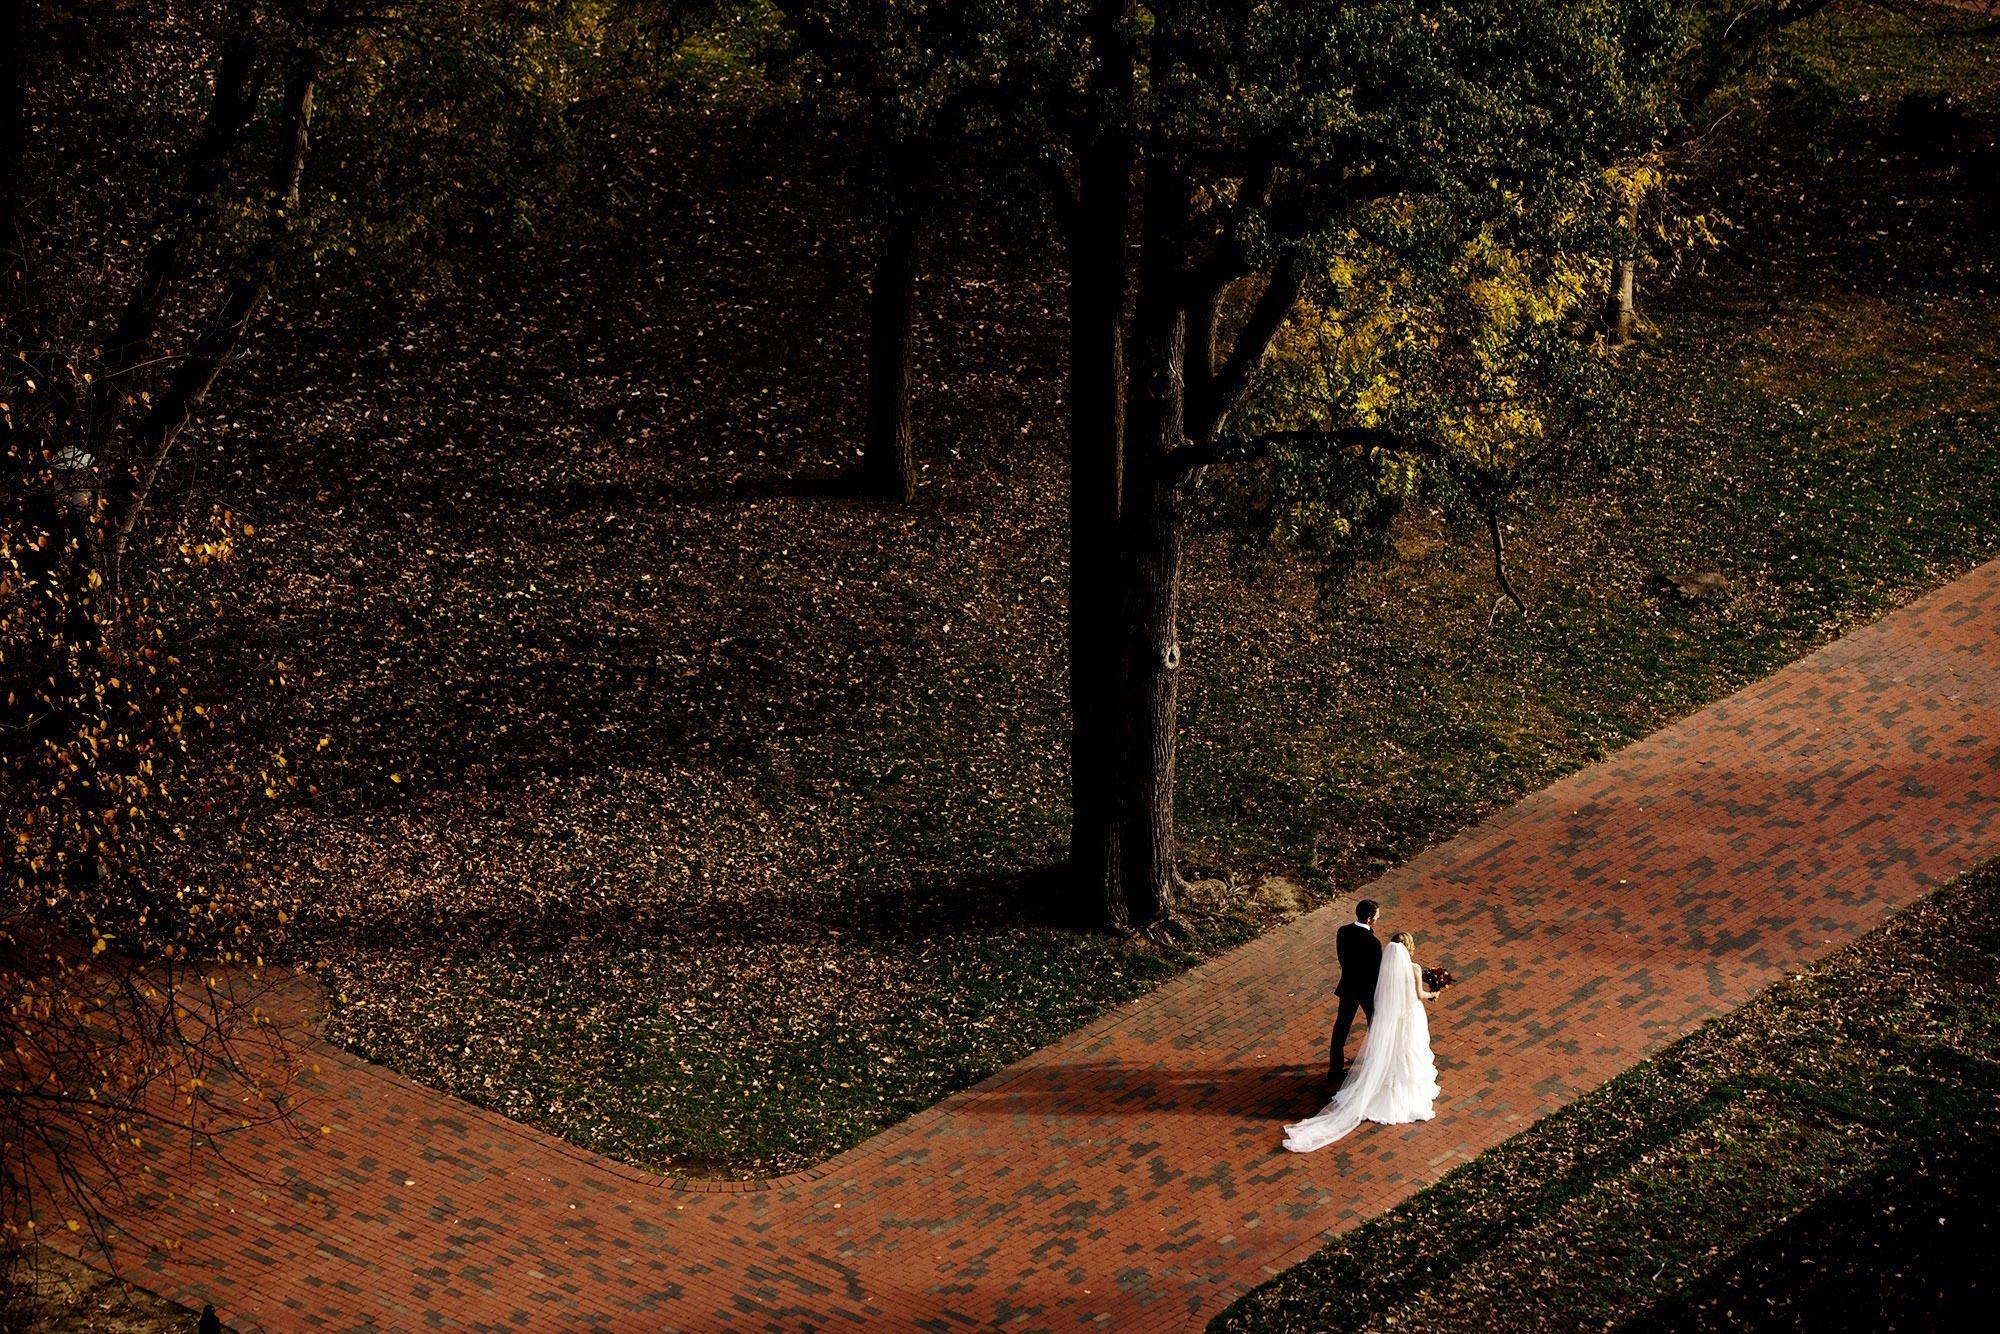 Hay Adams DC Wedding  I  The bride and groom walk through Lafayette Park before the wedding ceremony.